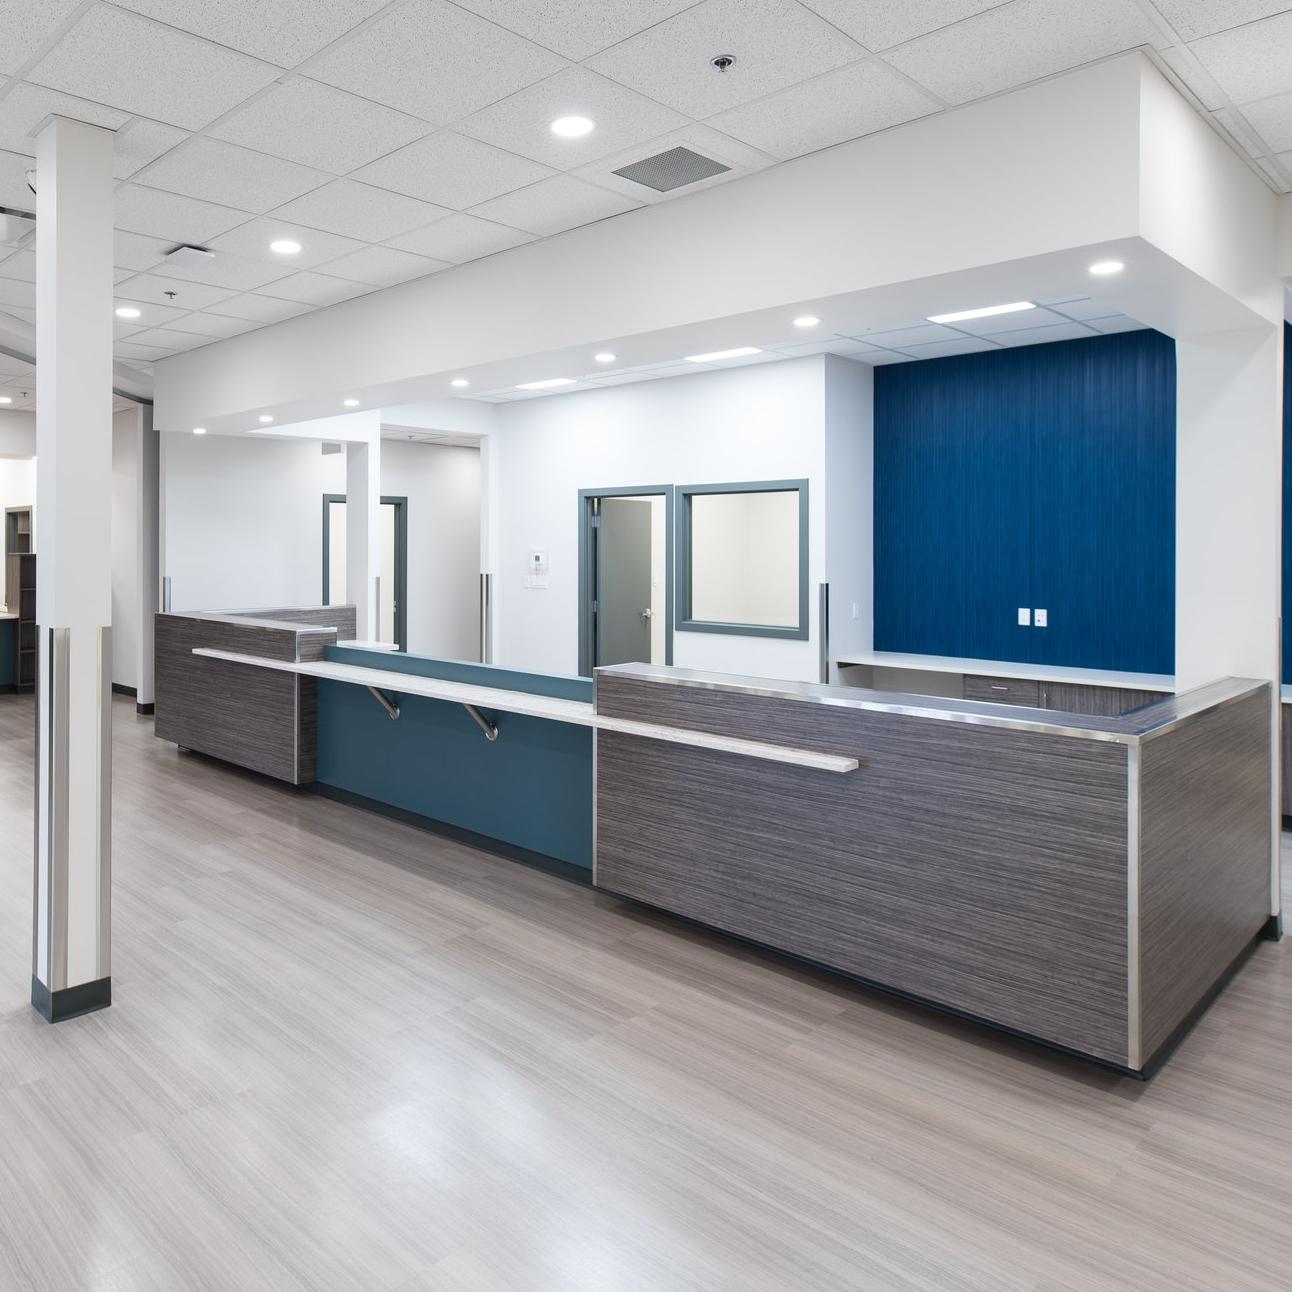 Abbotsfield Clinic-3633.jpg